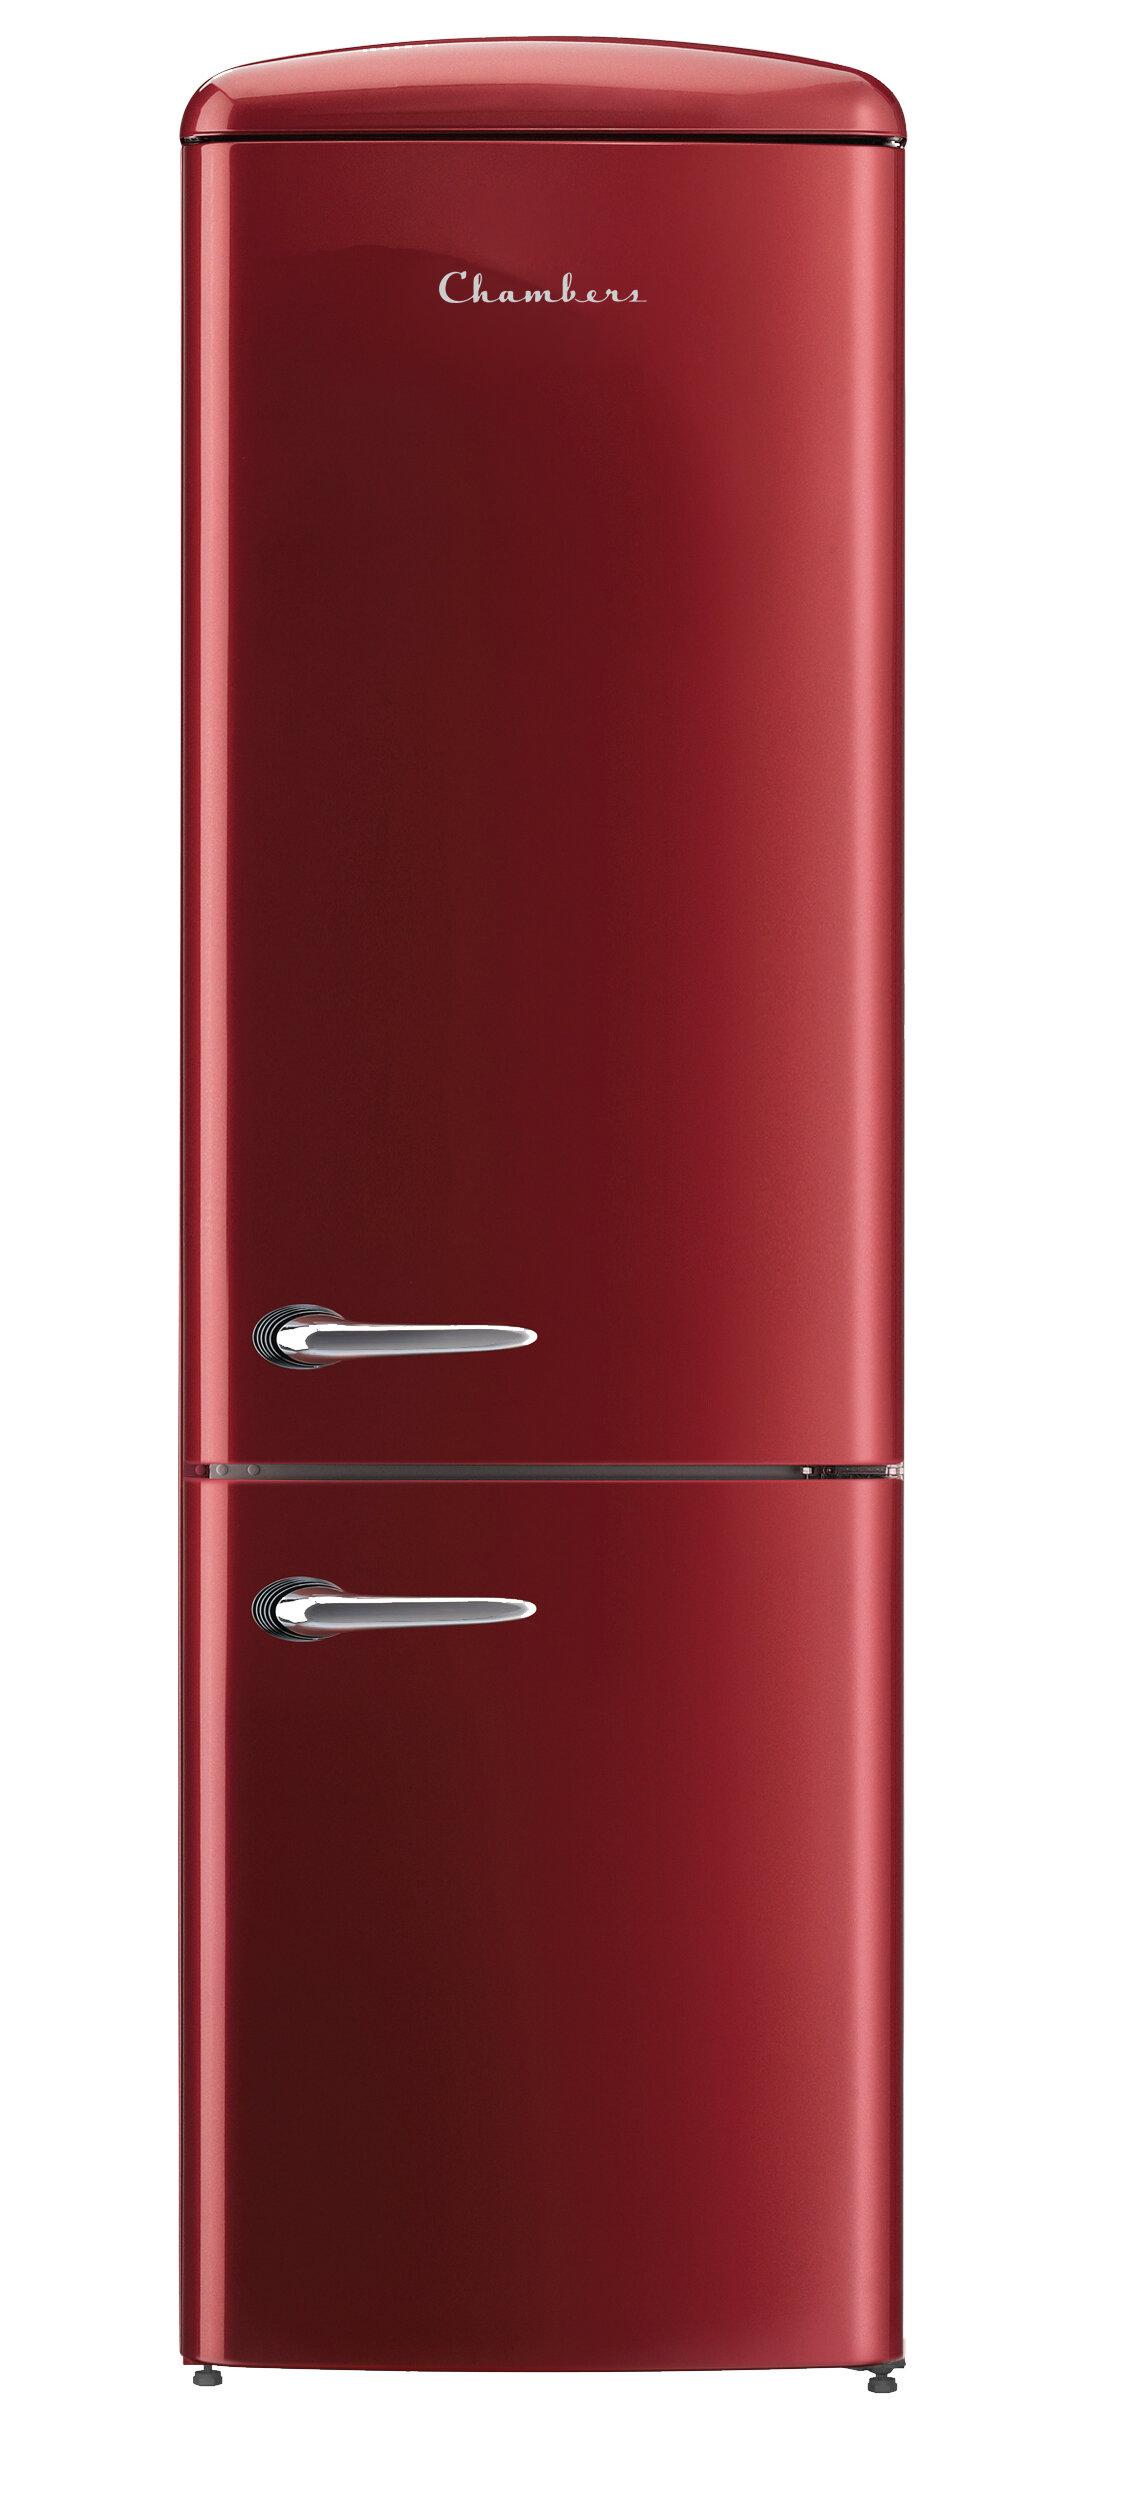 Big Chill Refrigerator | Wayfair